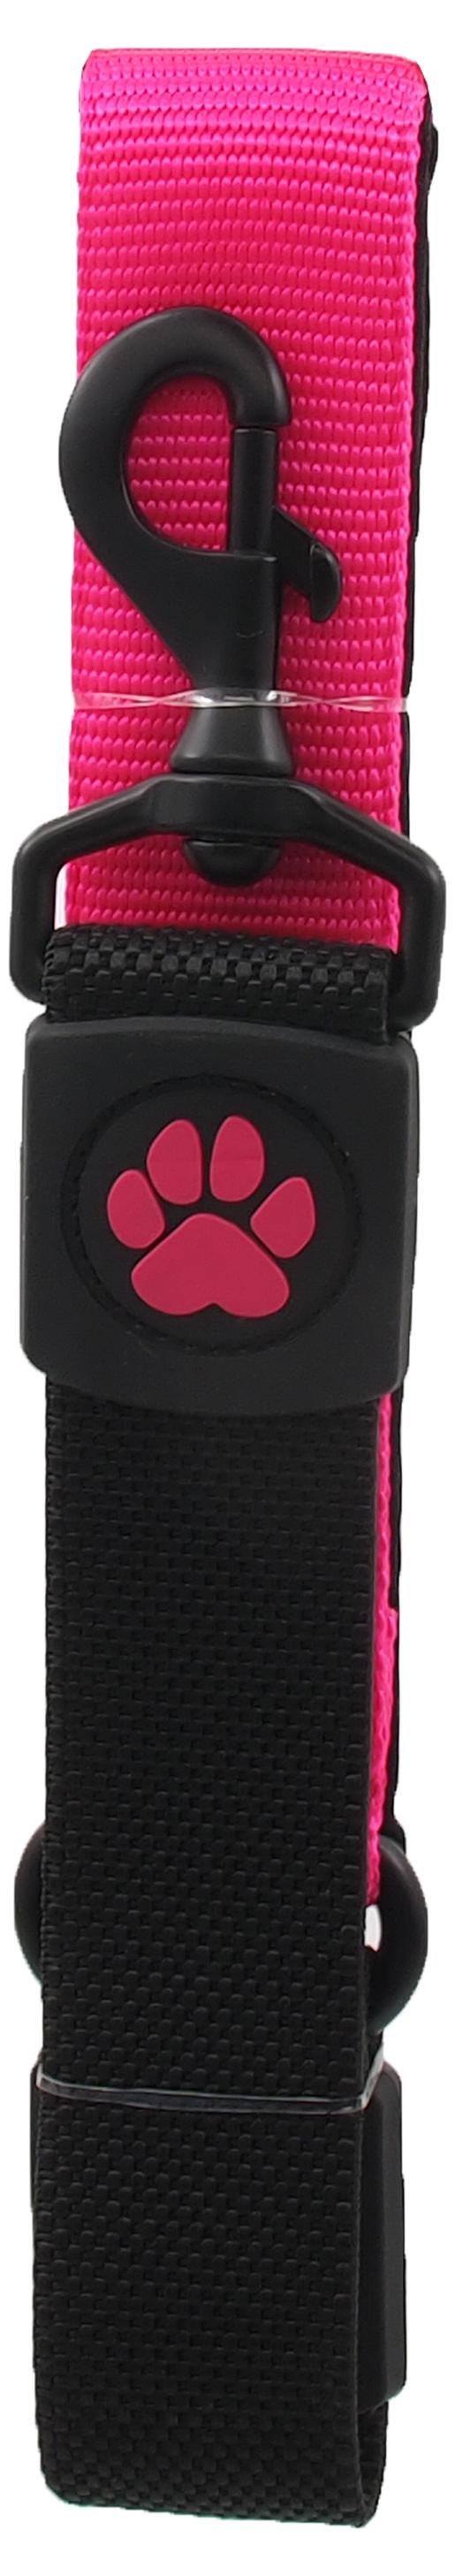 Dog Fantasy Vodítko Active Dog Bungee Neoprene XL růžové 3,8x55cm